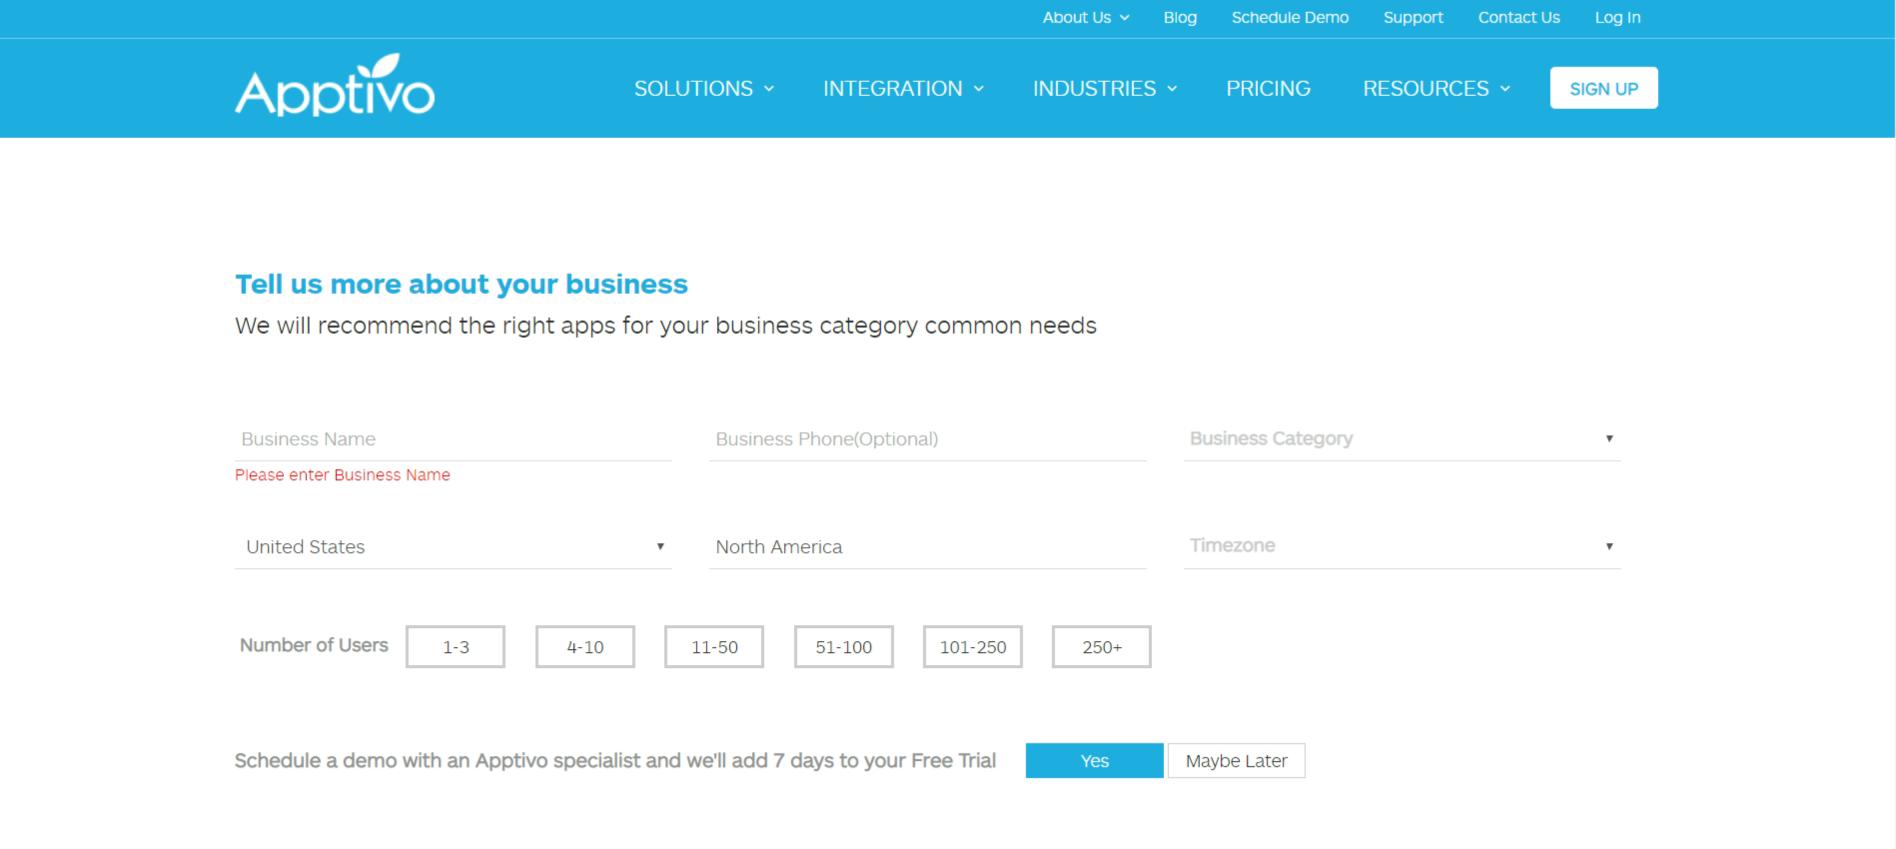 Apptivo Business Page